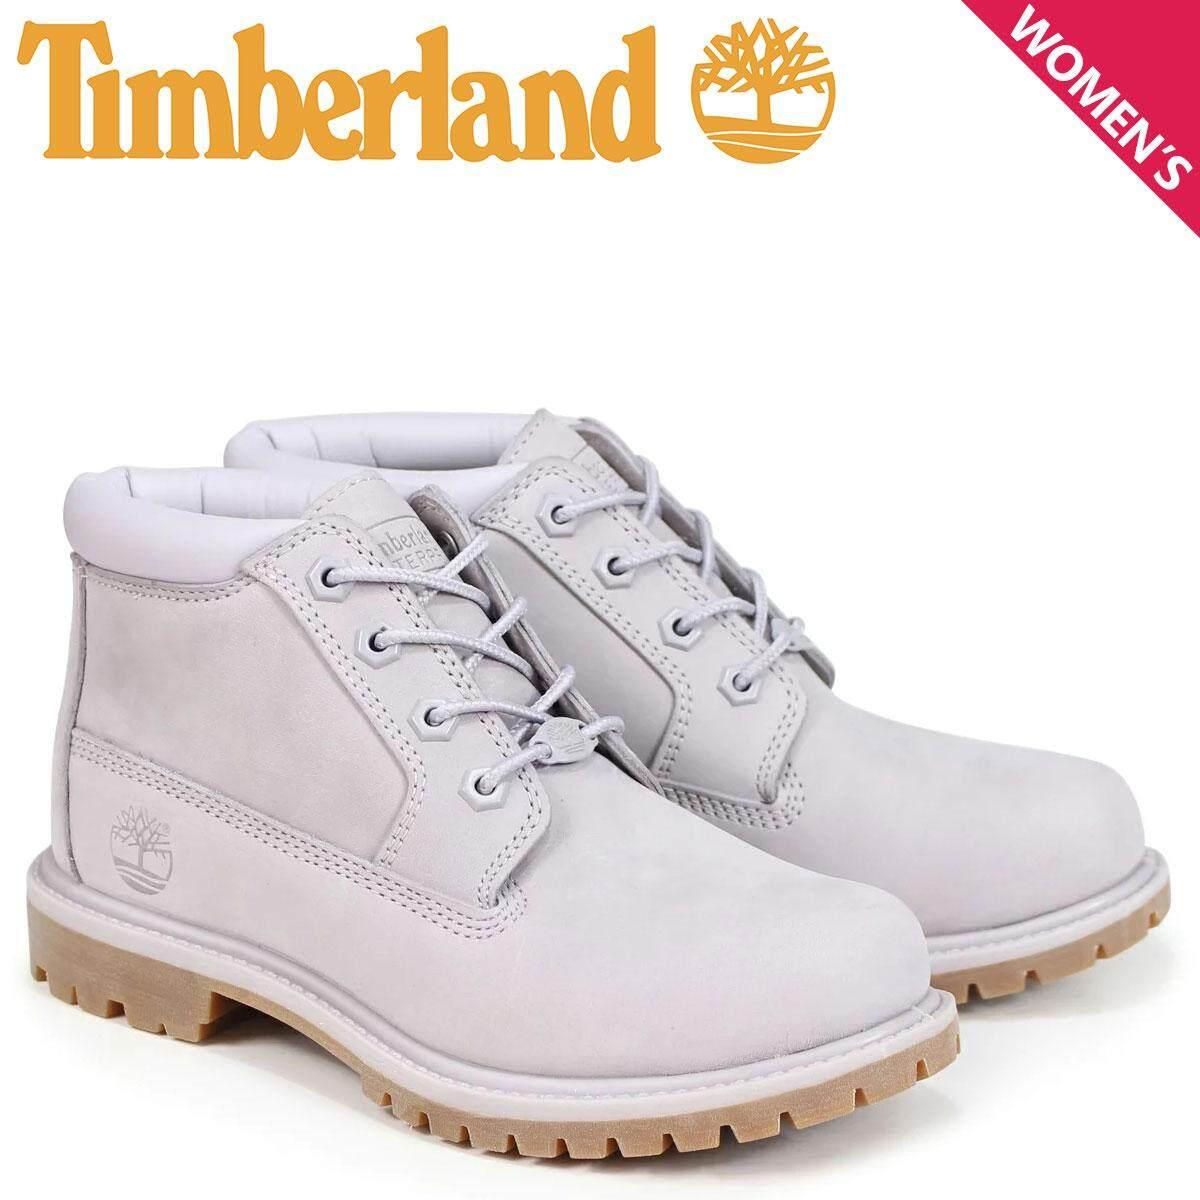 Sepatu Boot Timberland Nellie Lightweight Double A1S7R W Lampu Lebar Abu-abu 9ed3fdd621